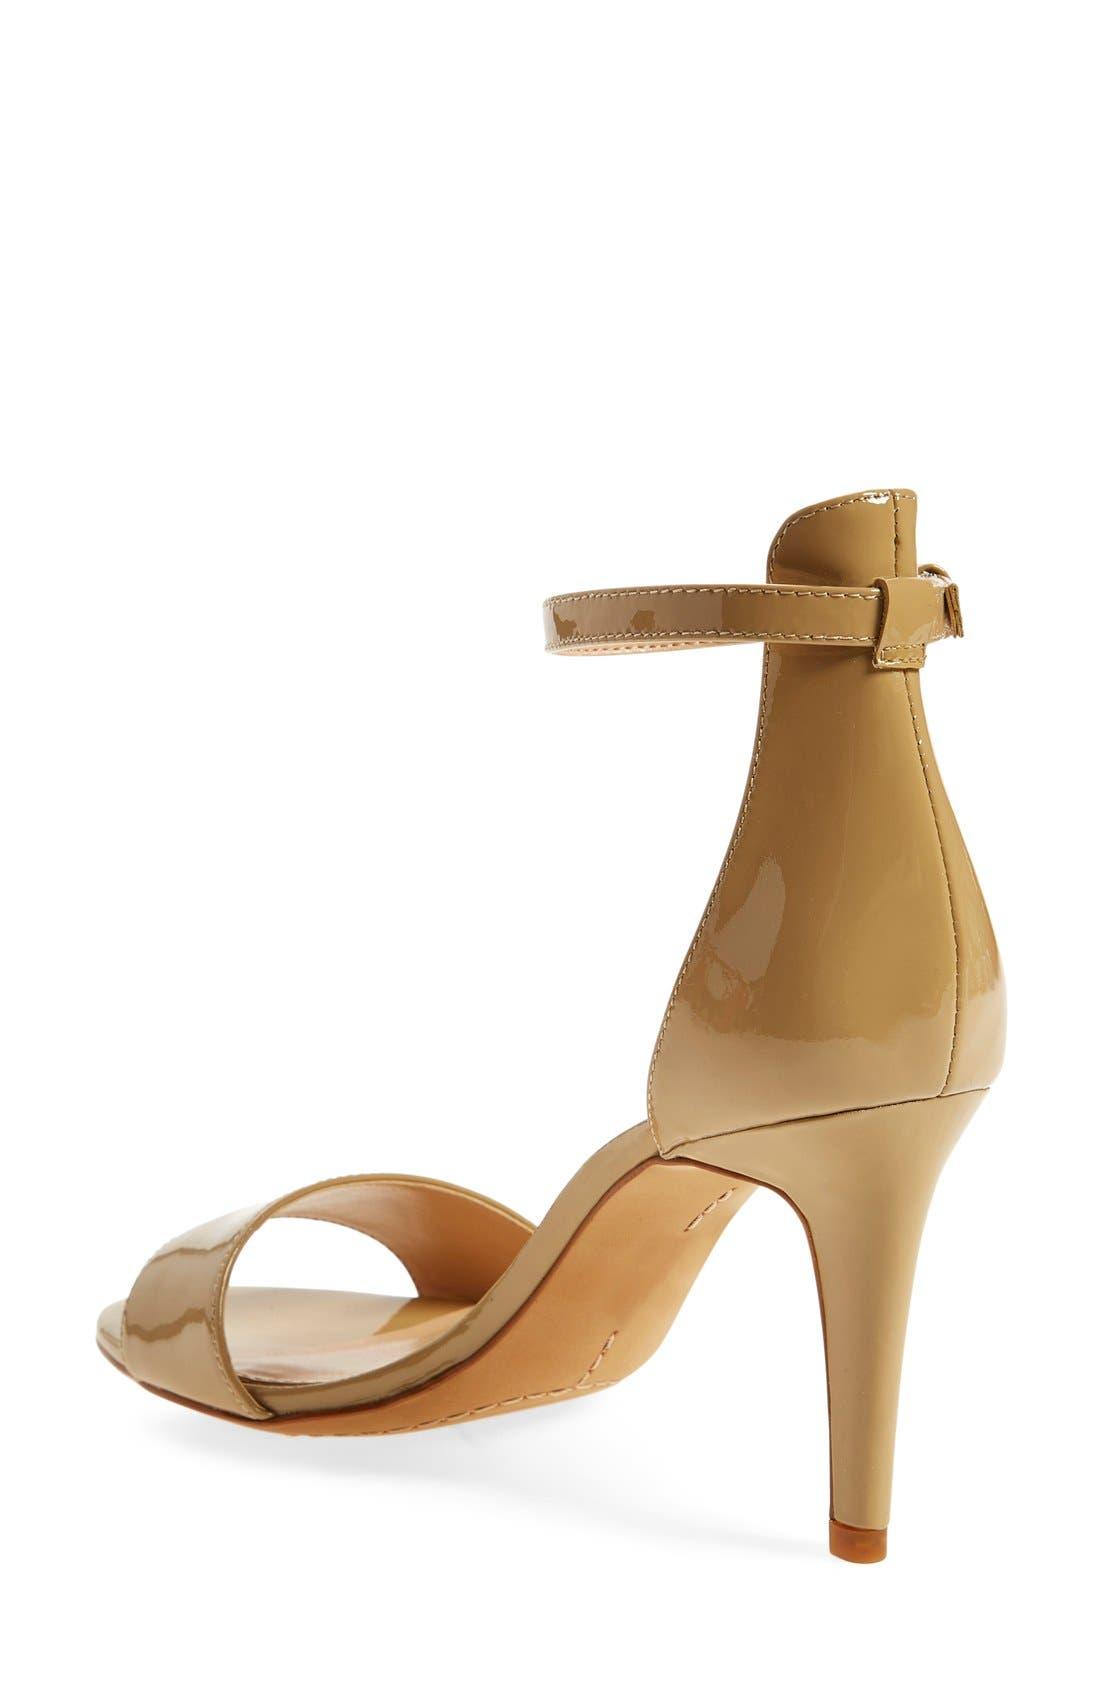 ,                             'Court' Ankle Strap Sandal,                             Alternate thumbnail 55, color,                             250